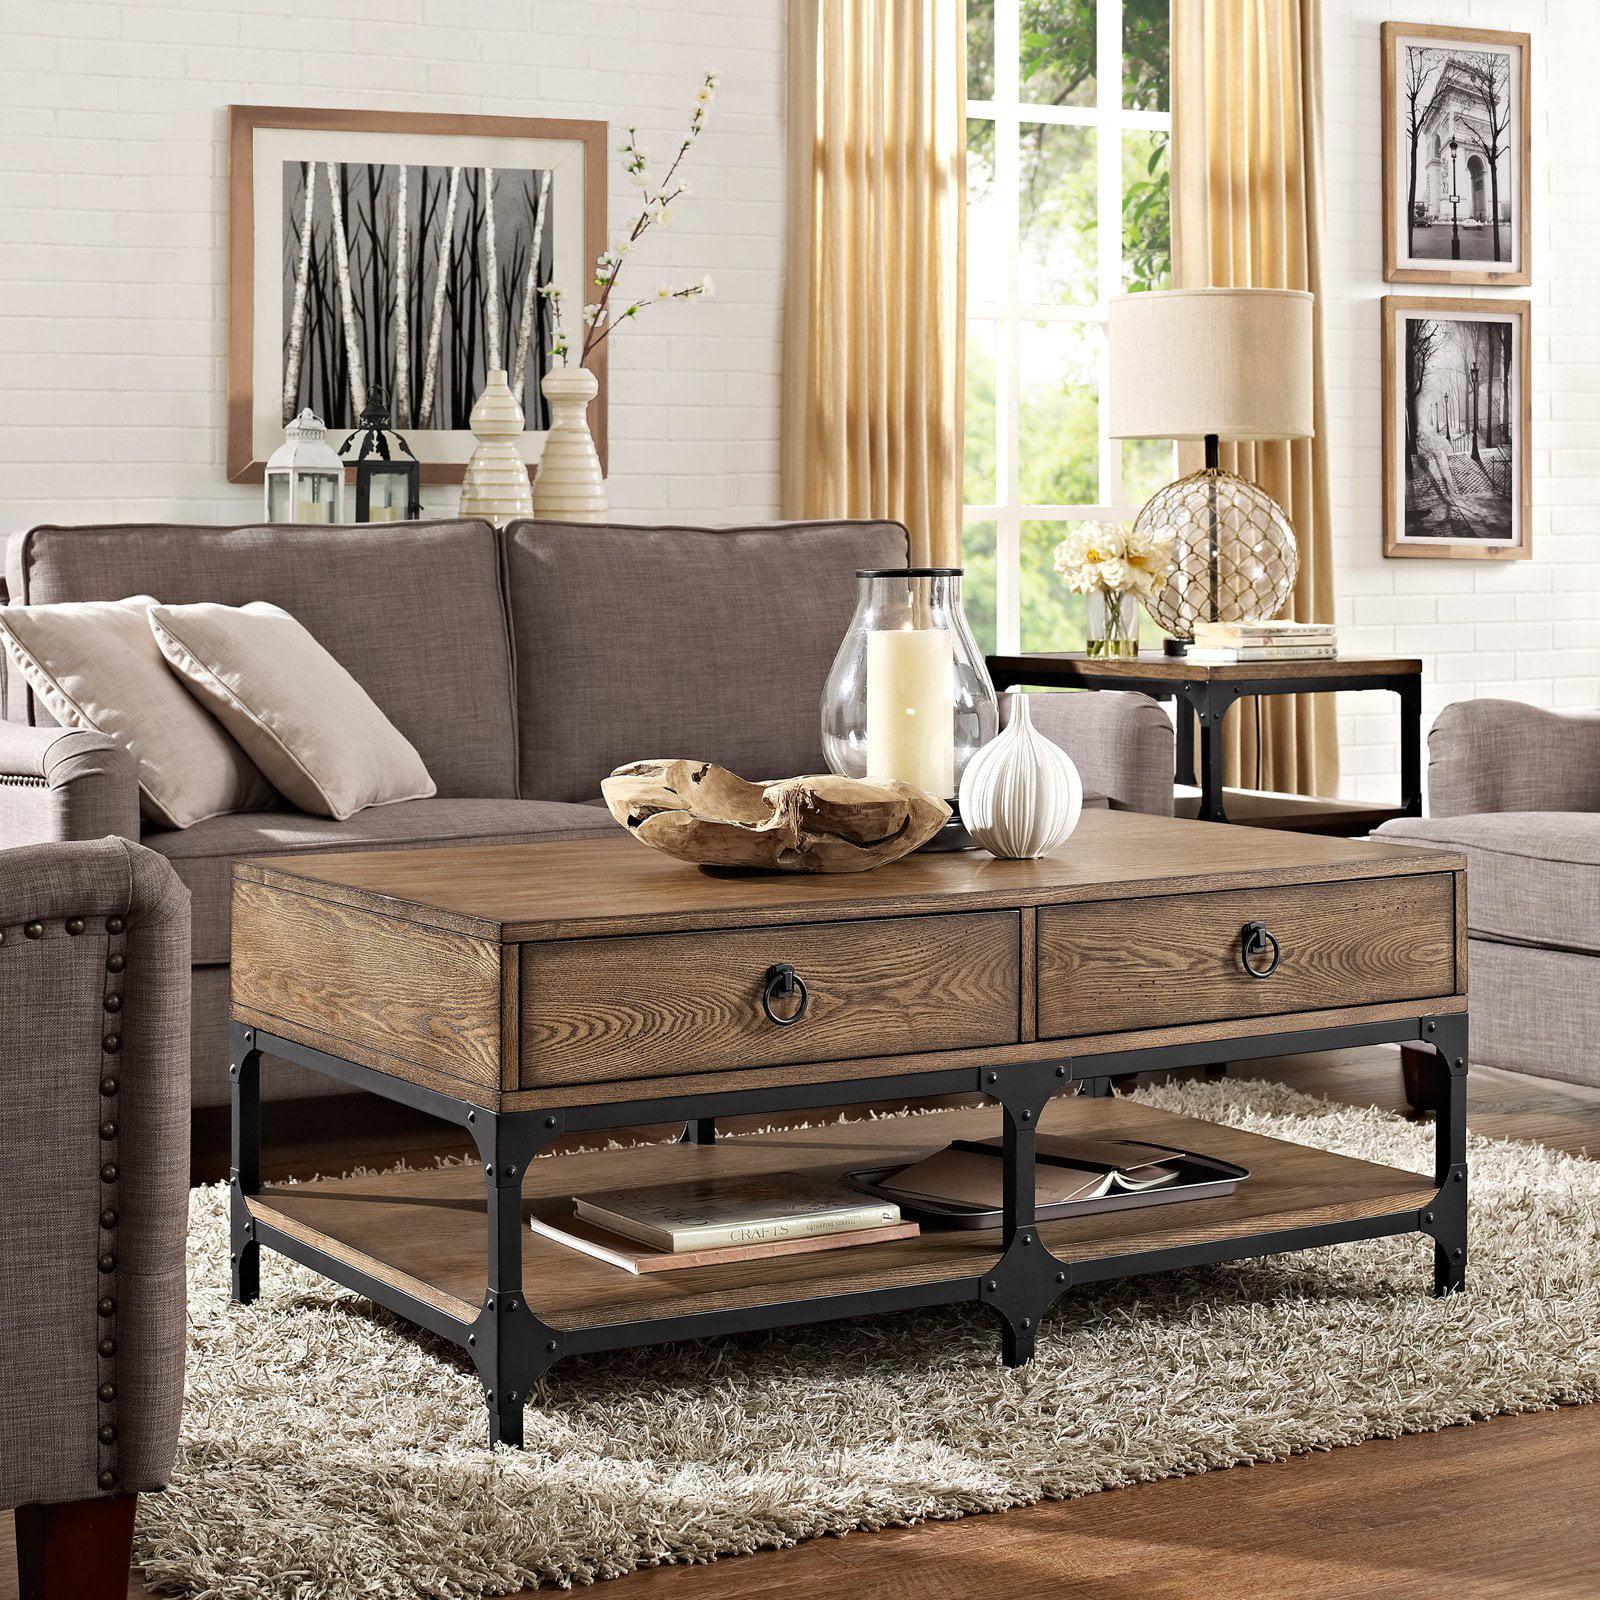 Crosley Furniture Trenton Coffee Table, Coffee